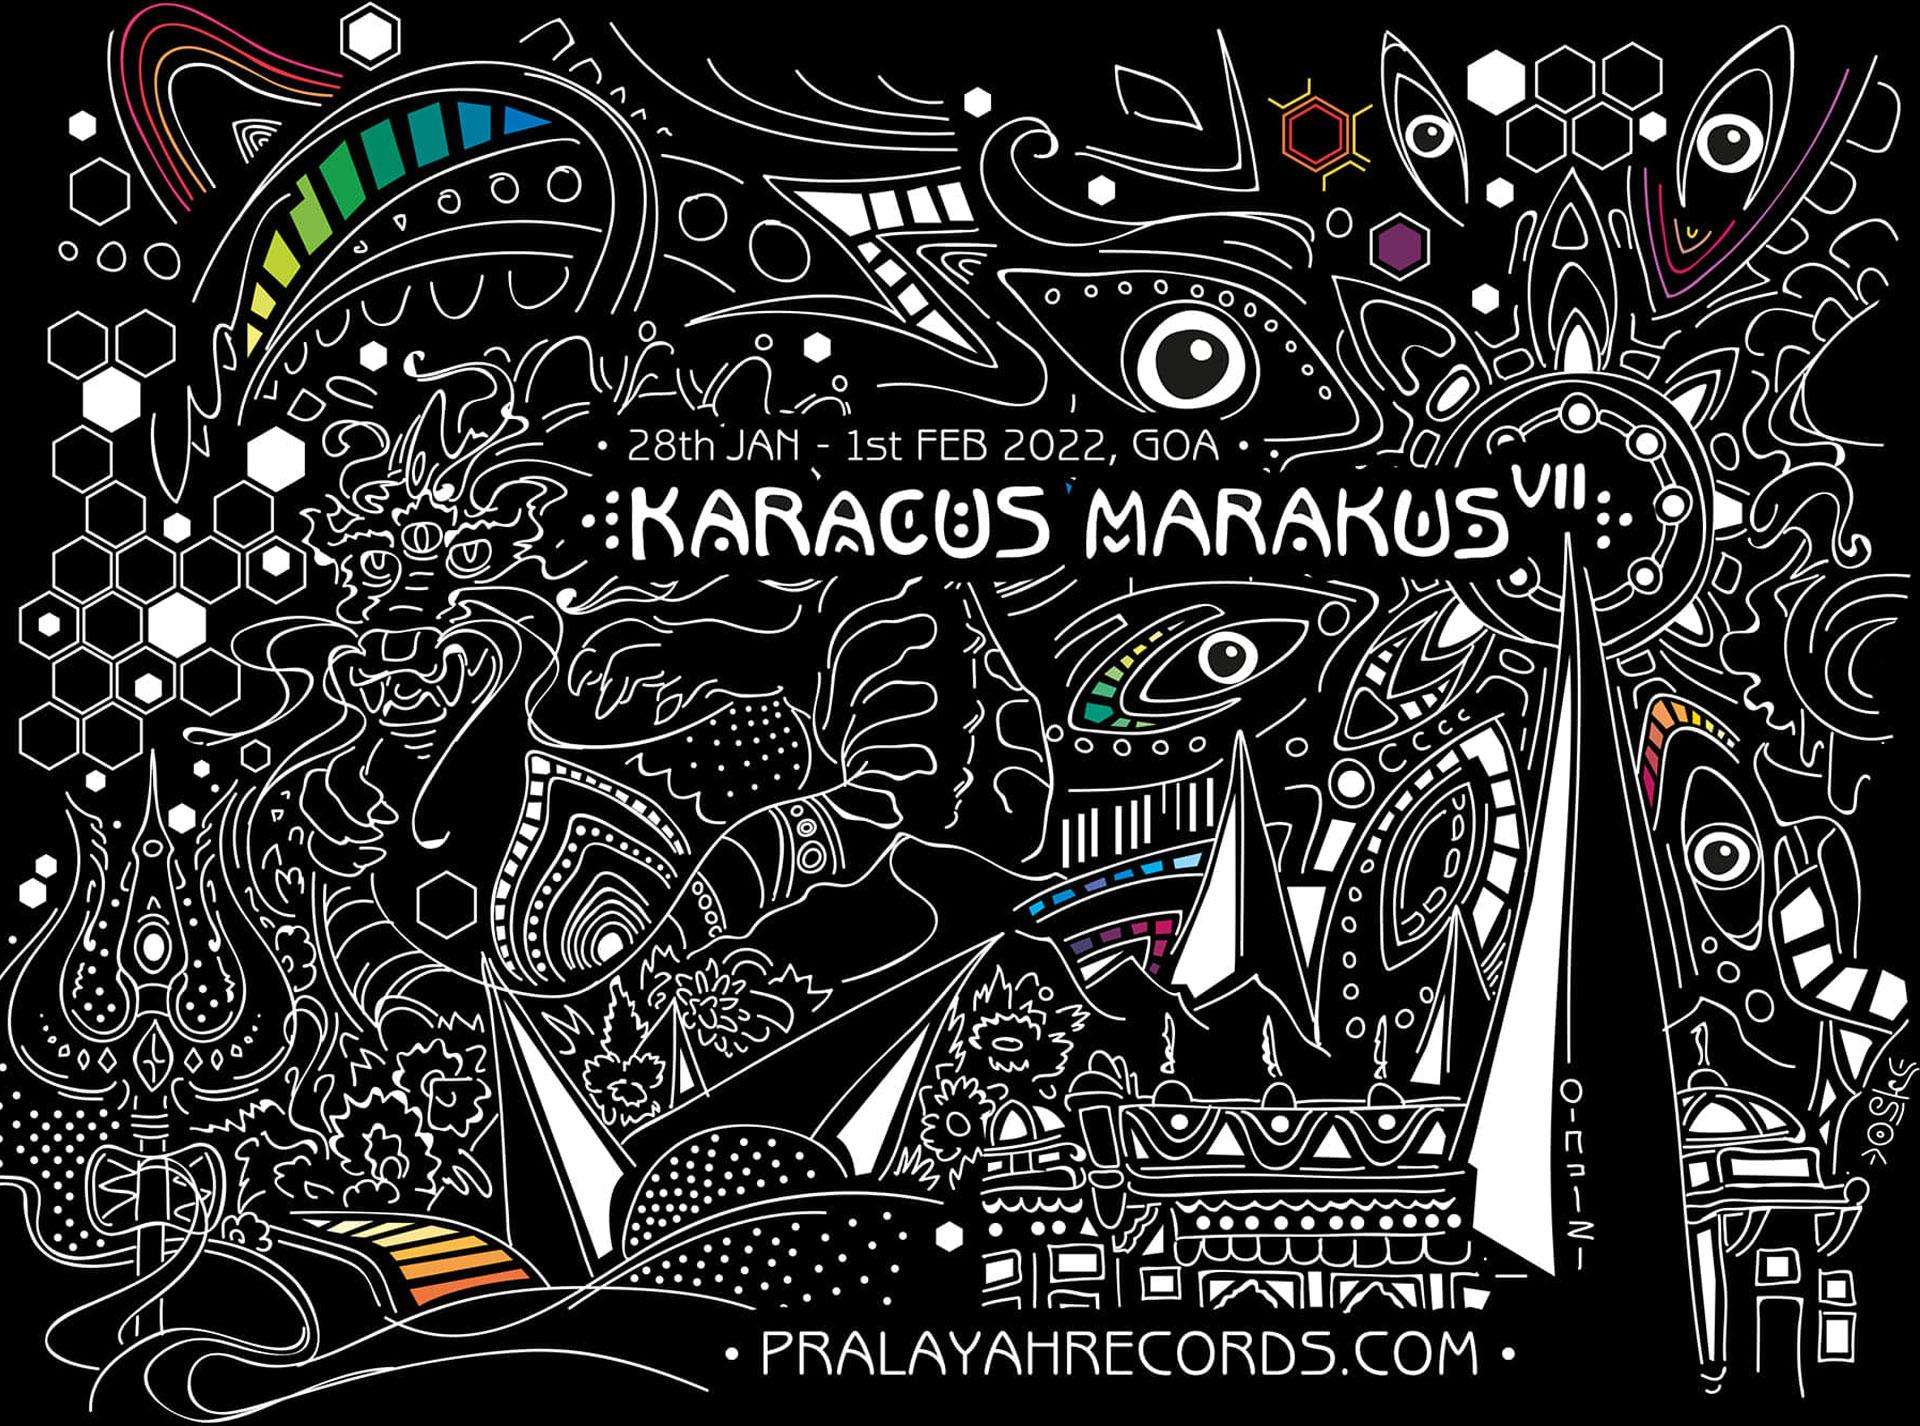 PRALAYAH_V11